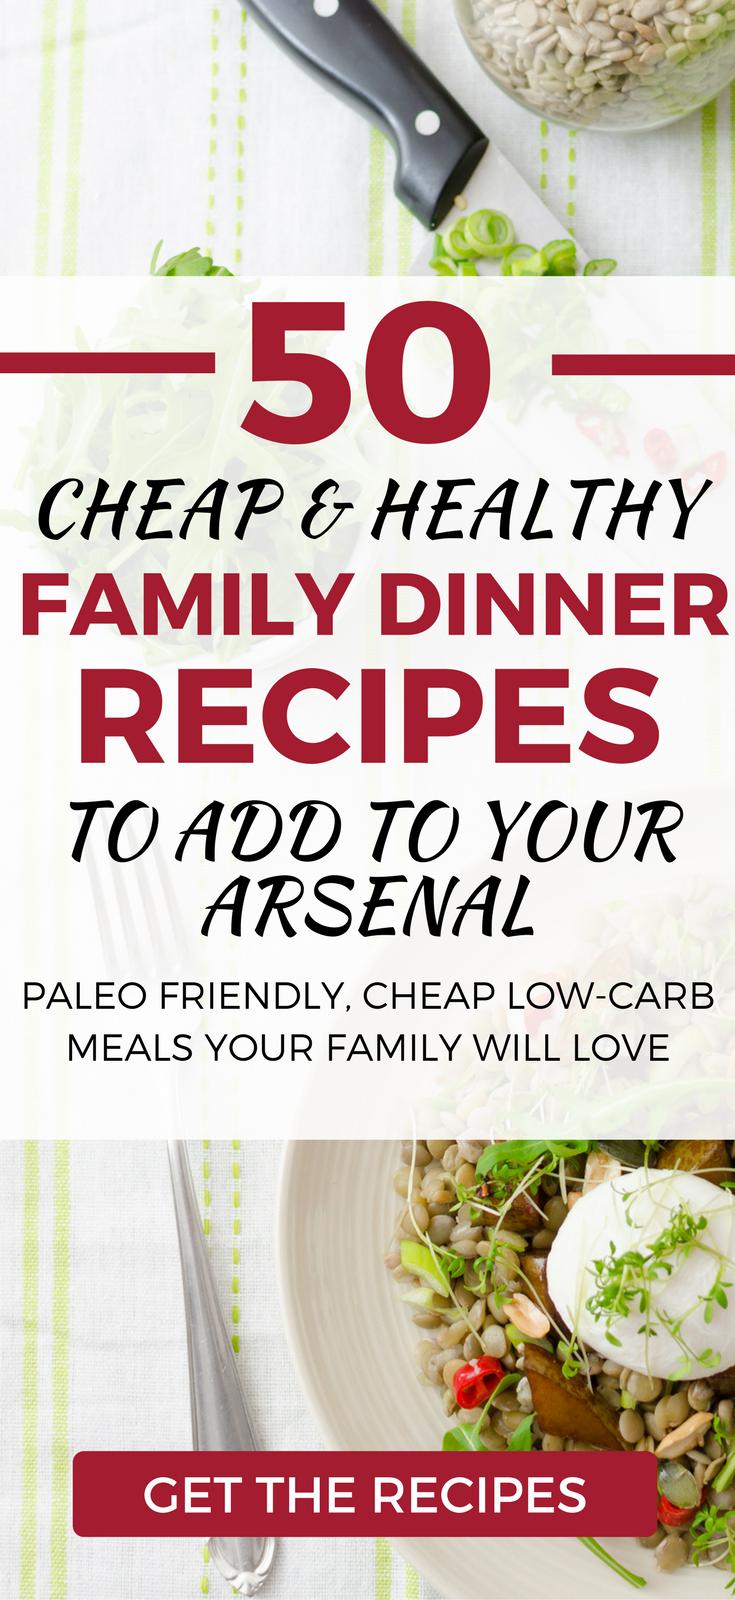 50 Paleo Friendly Cheap Healthy Dinner Ideas A List Of